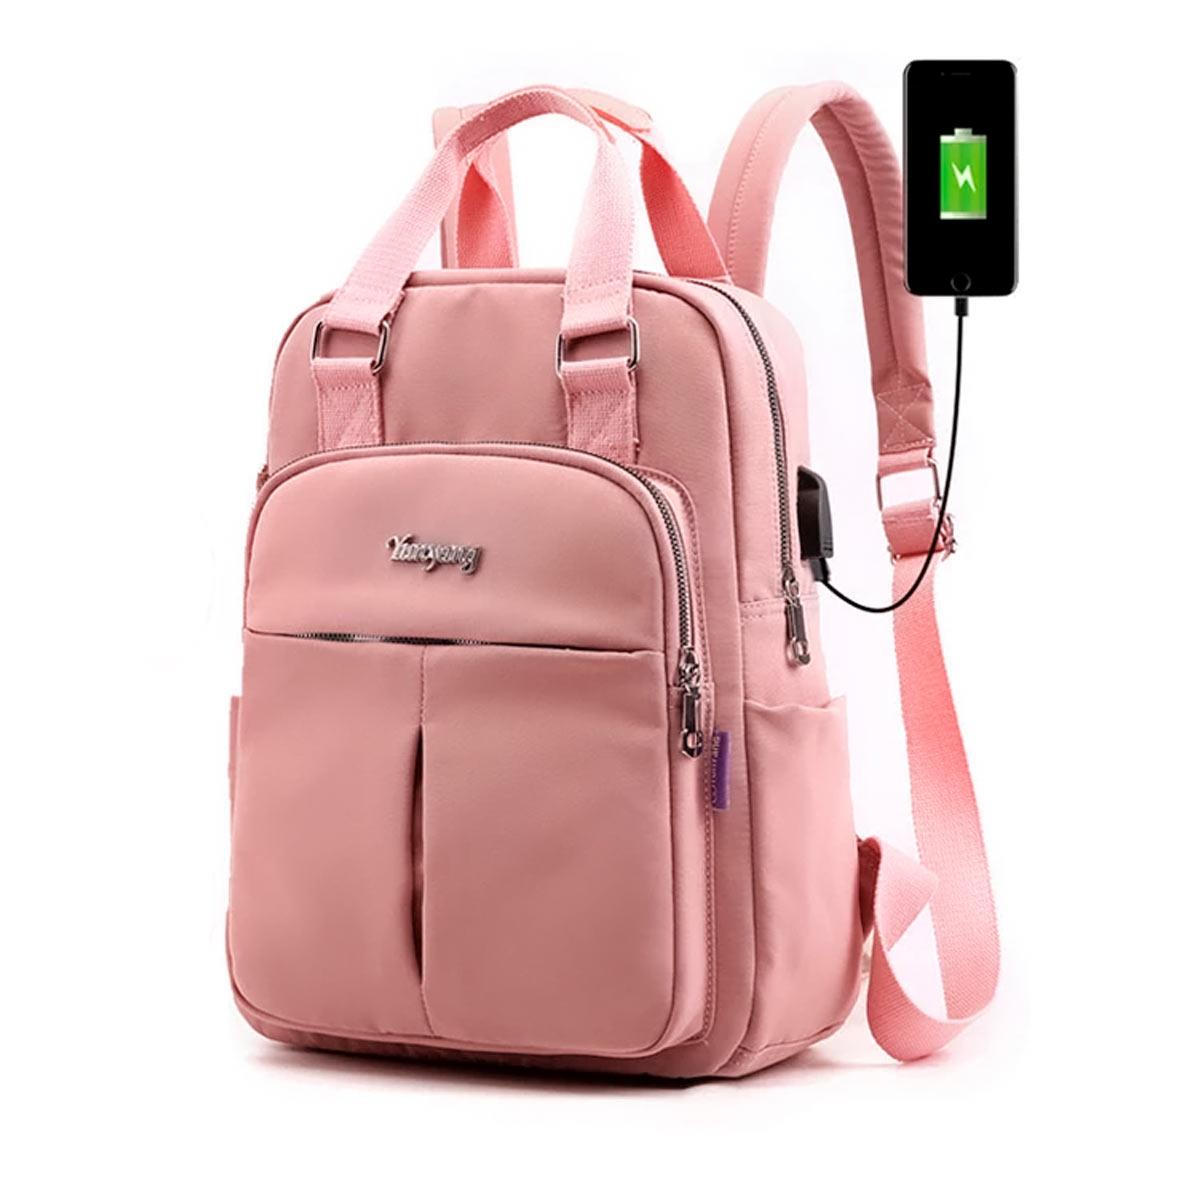 Mochila Bolsa Feminina Antifurto USB Impermeável Casual